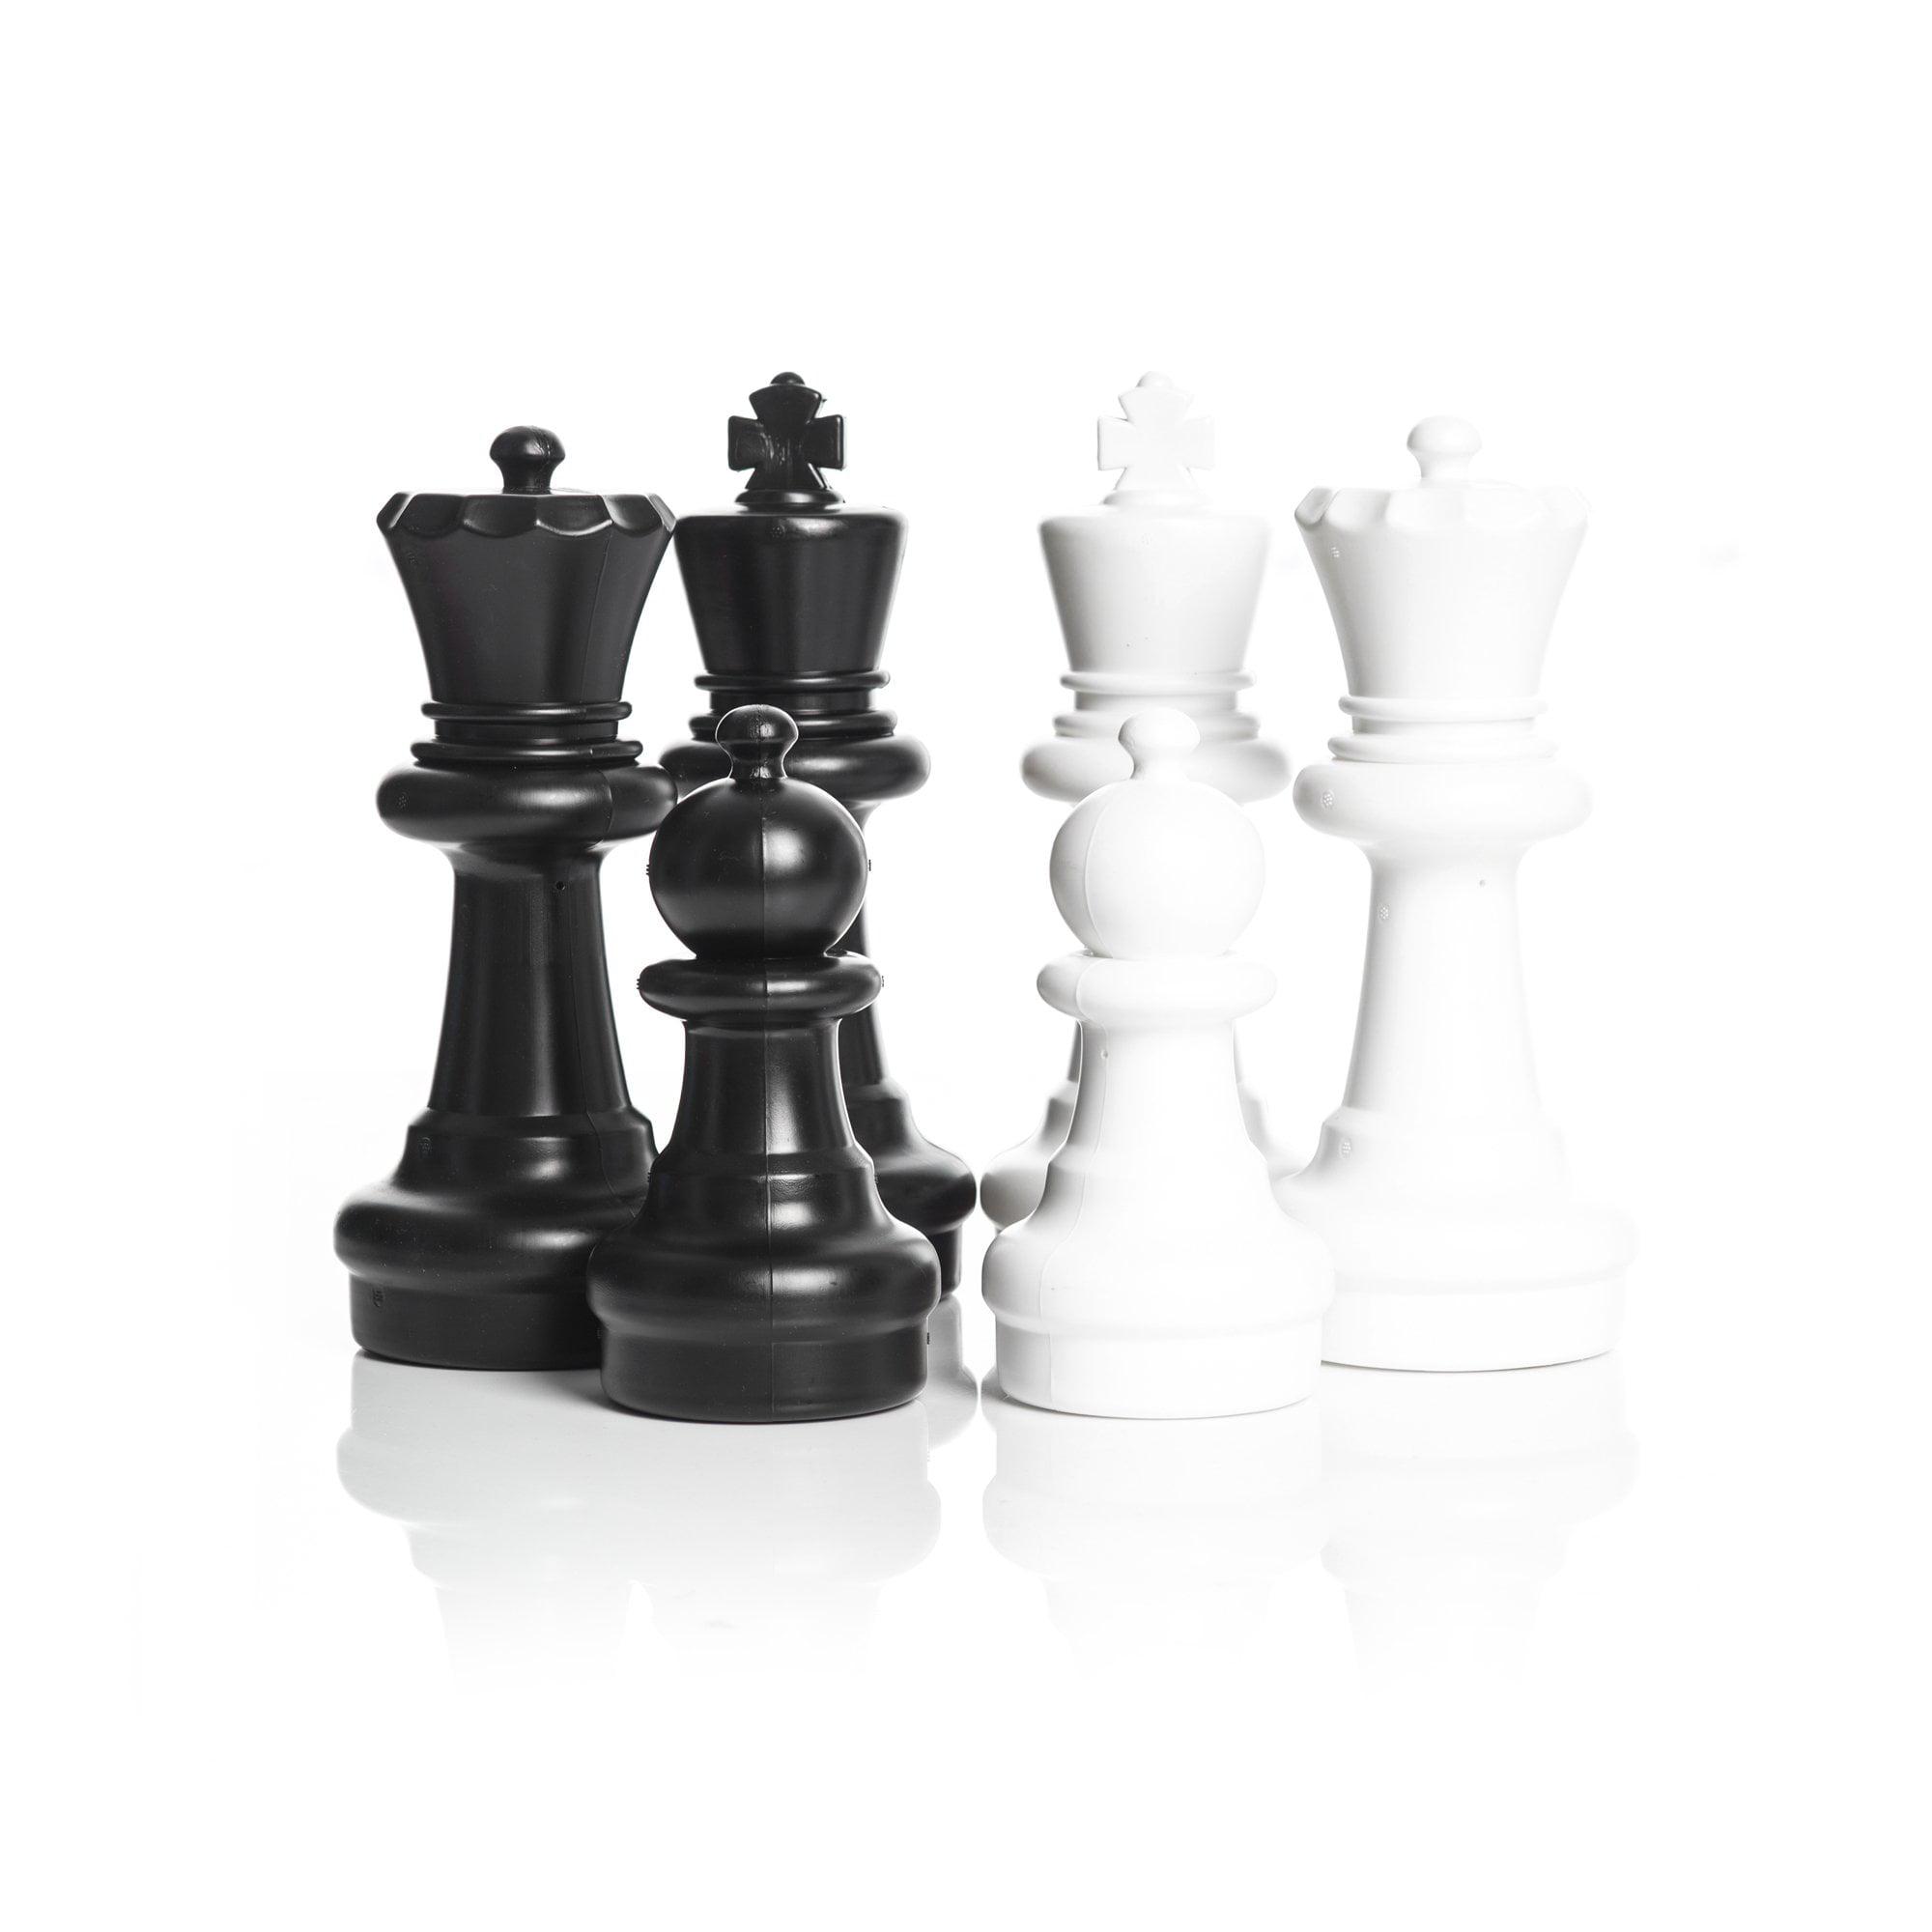 MegaChess 12 Inch Plastic Chess Set (No Board) by MegaChess